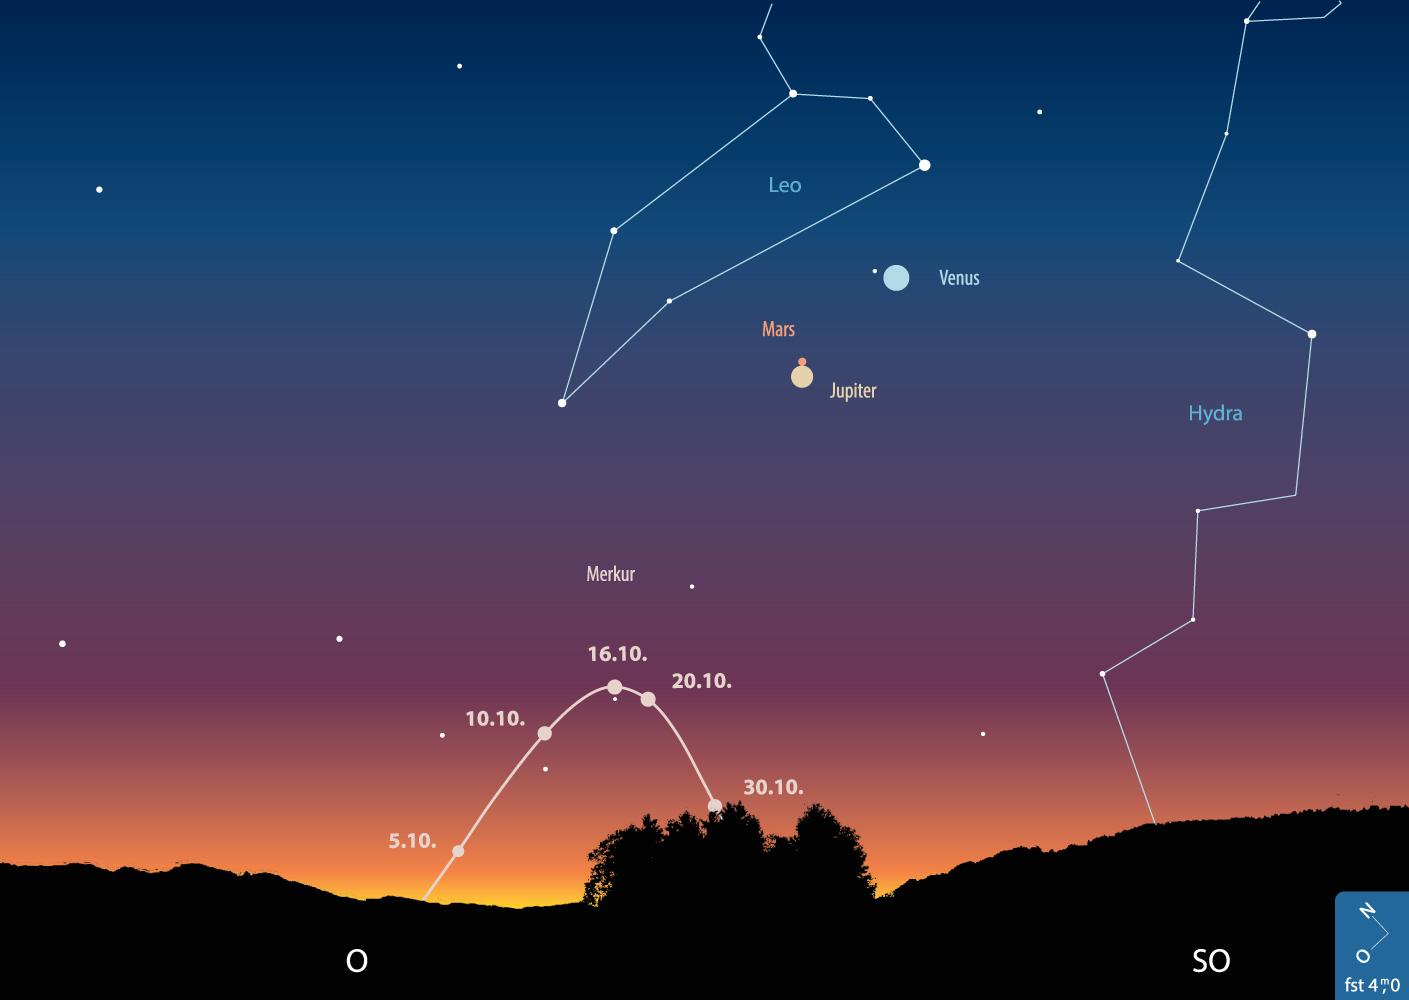 Merkur im Oktober am Morgenhimmel, Sonne 6° unter dem Horizont.